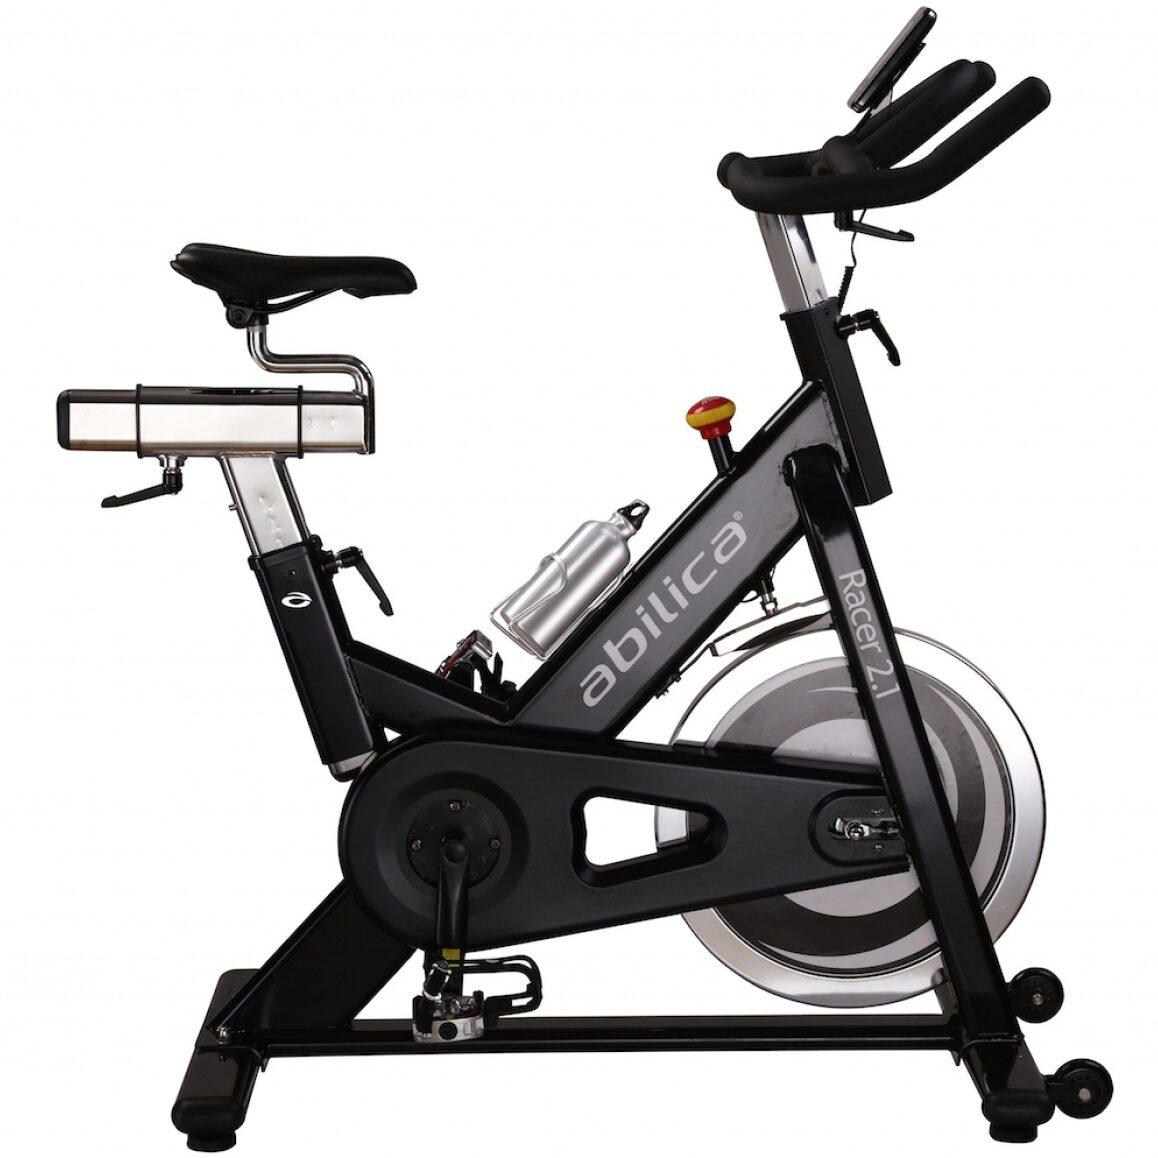 Abilica spinningcykel